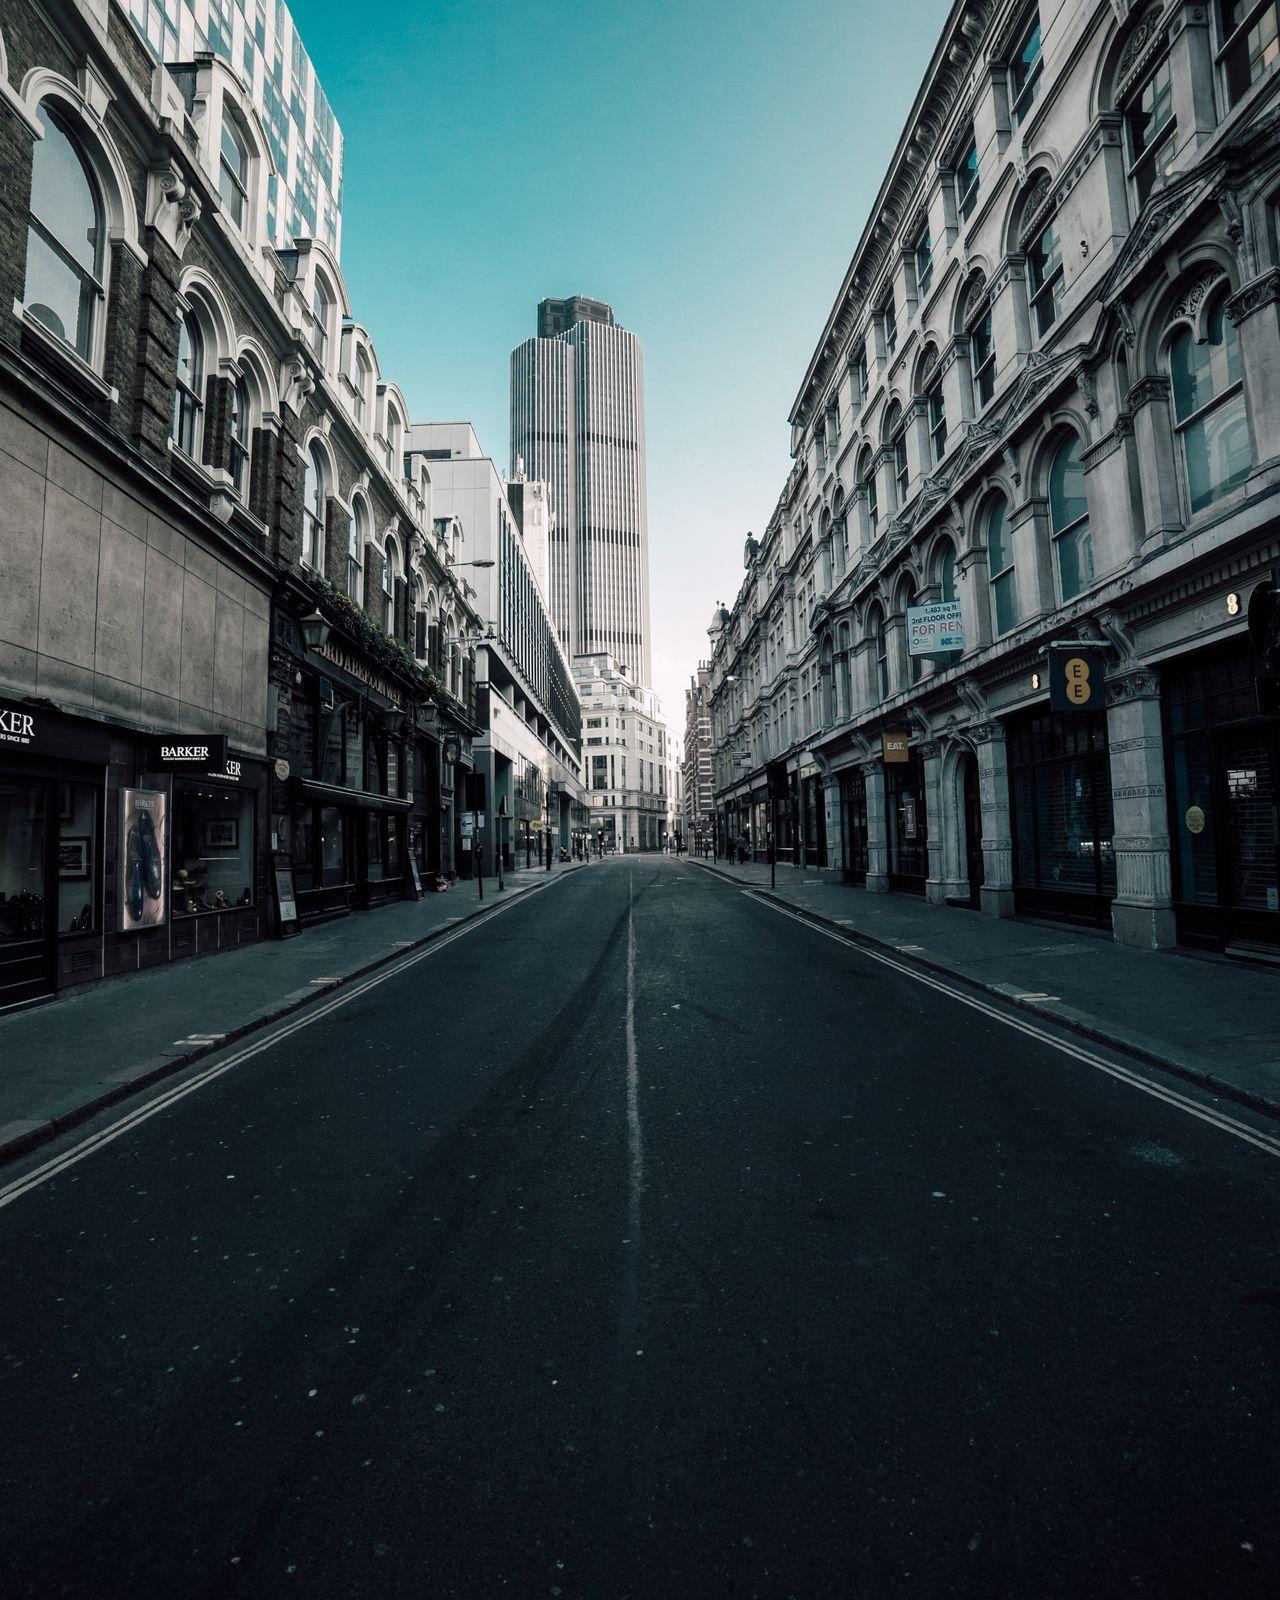 Empty streets Architecture No People Cityscape The Architect - 2017 EyeEm Awards The Street Photographer - 2017 EyeEm Awards EyeEm Best Shots Built Structure